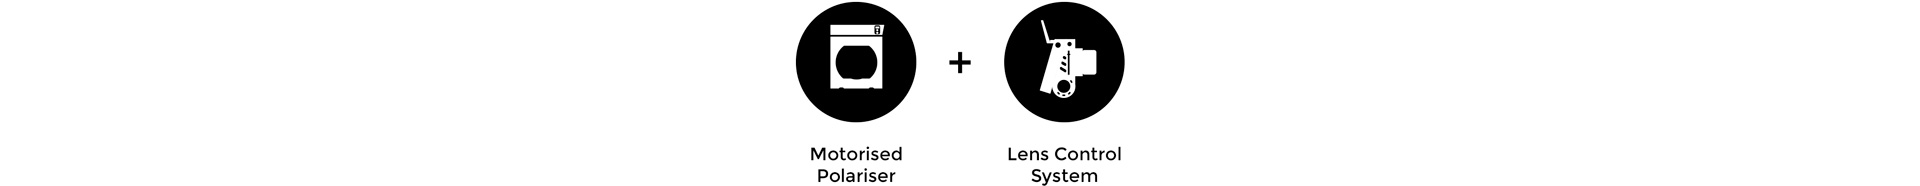 Cinefade Application remote polariser Motorised Polariser, LCS